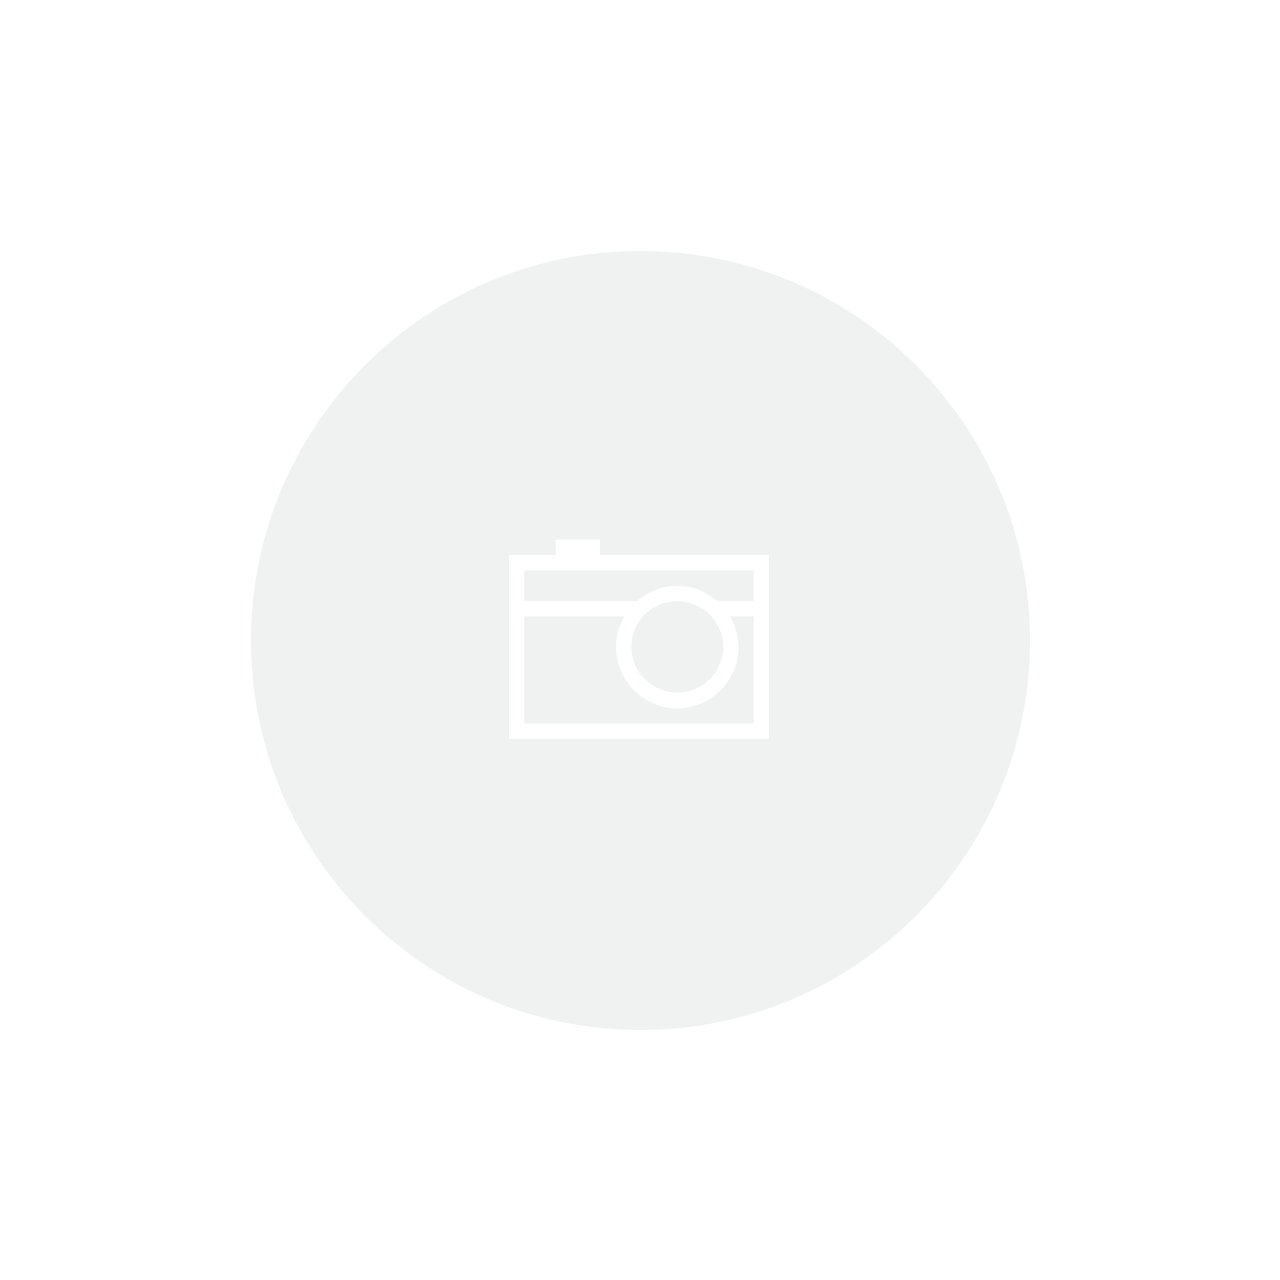 REFLETOR HOLOFOTE MICROLED SLIM 50W IP66 BRANCO FRIO